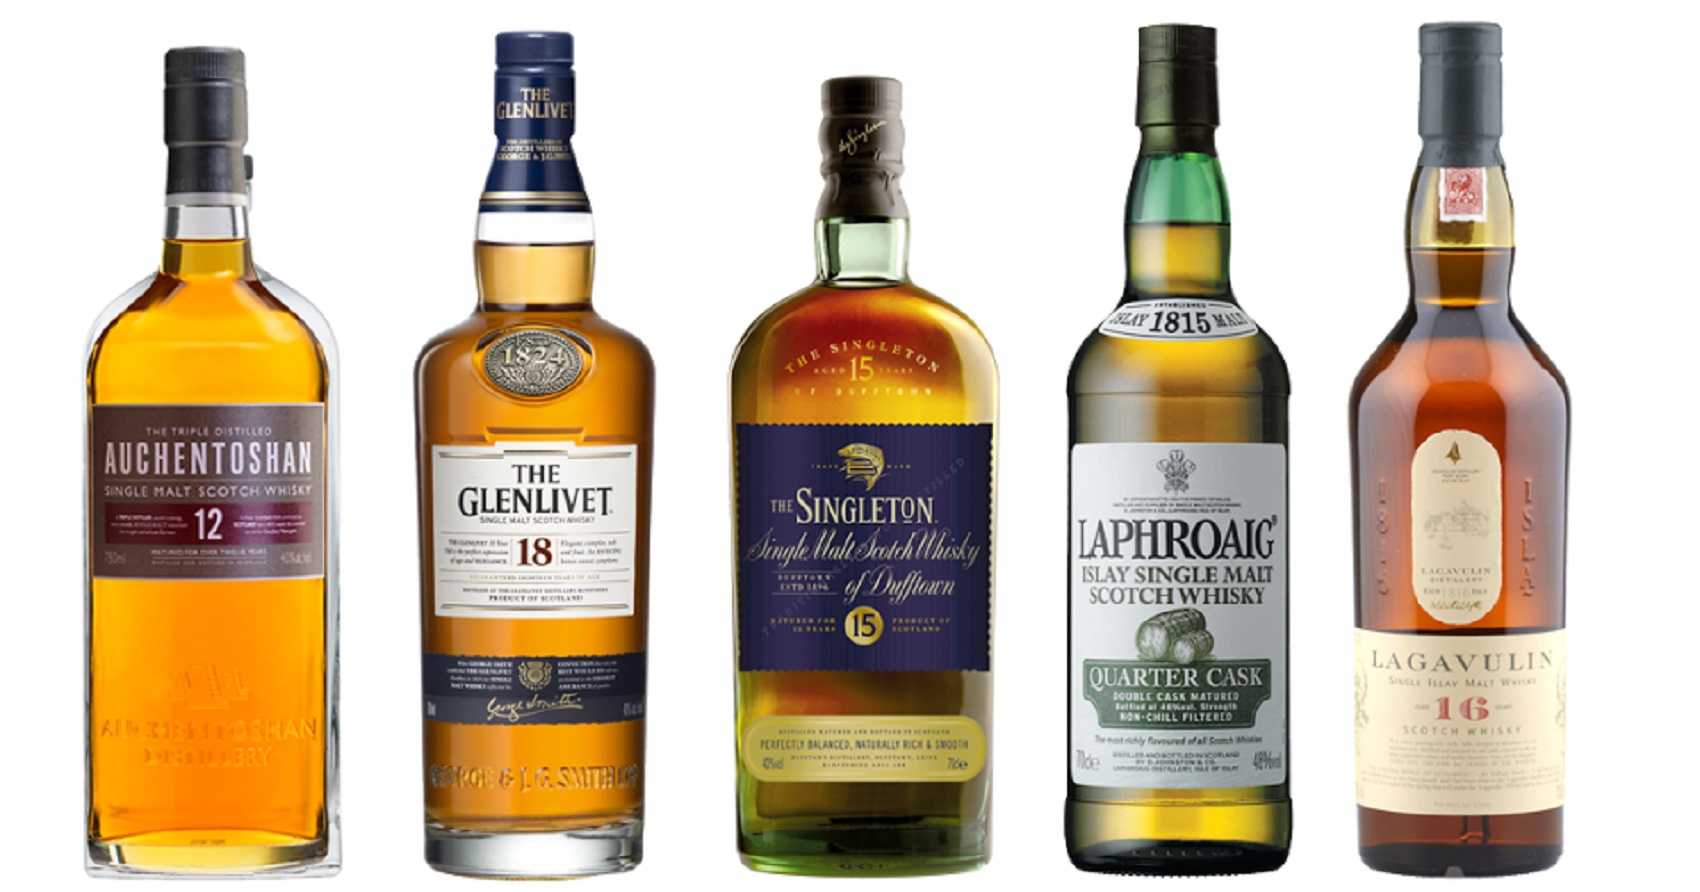 Flaviar, Scotch, Tasting, FactoryTwoFour